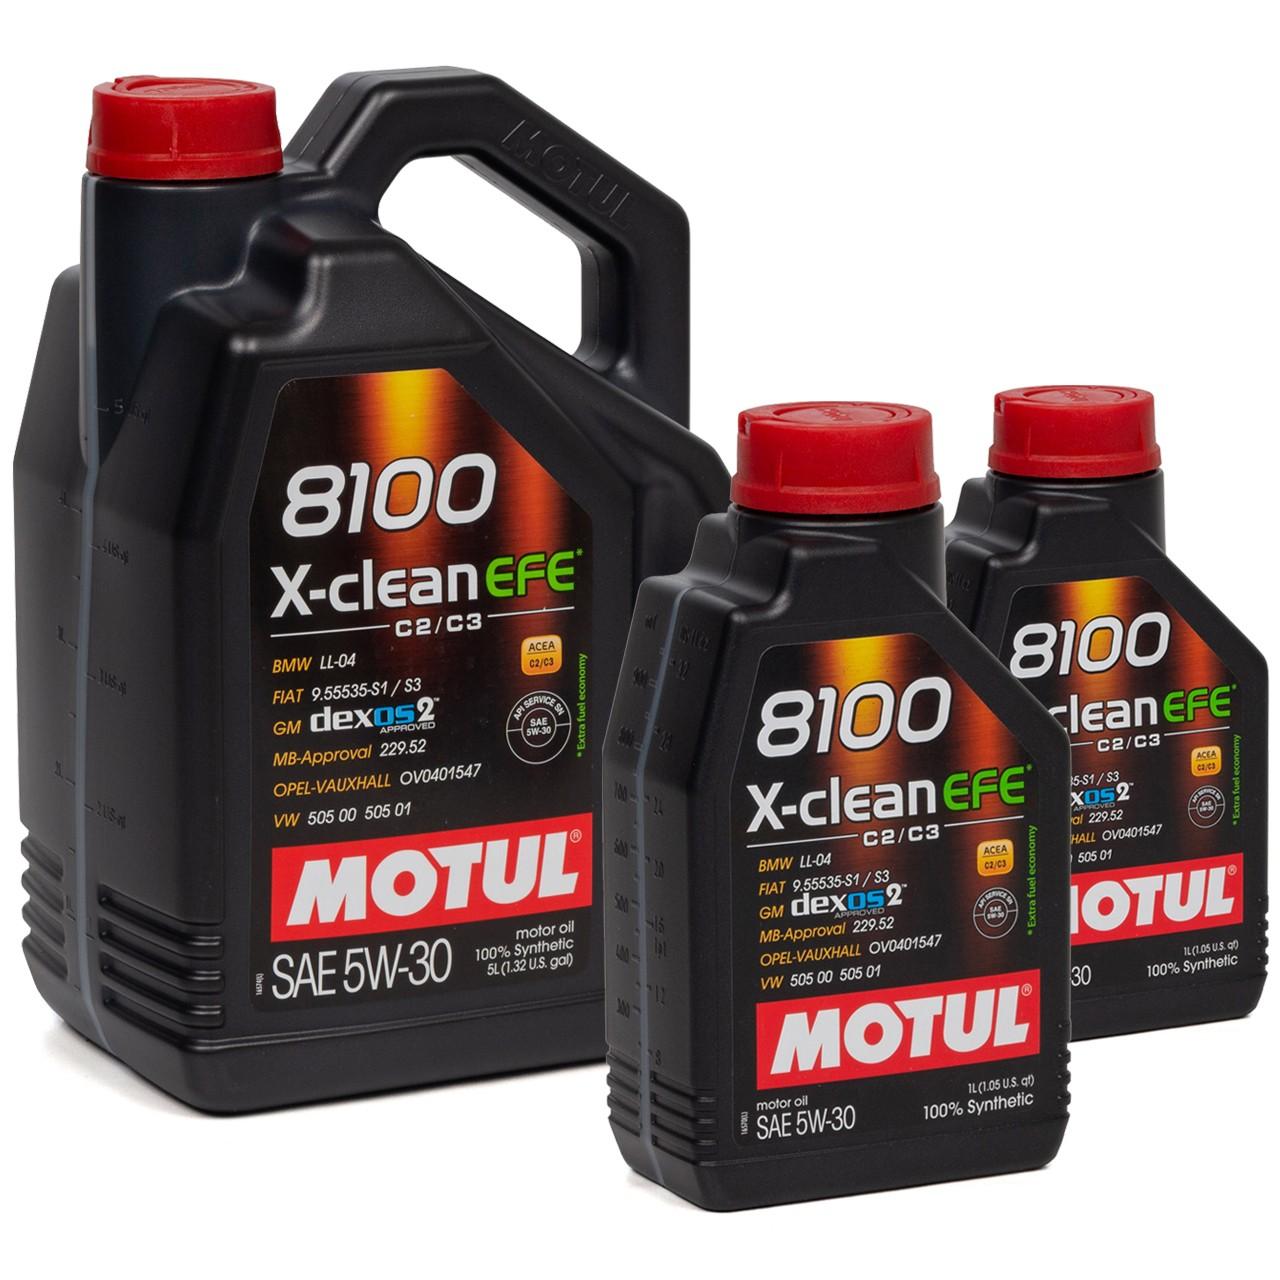 MOTUL 8100 X-Clean EFE Motoröl Öl 5W30 dexos2 VW 505.00/505.01 - 7L 7 Liter